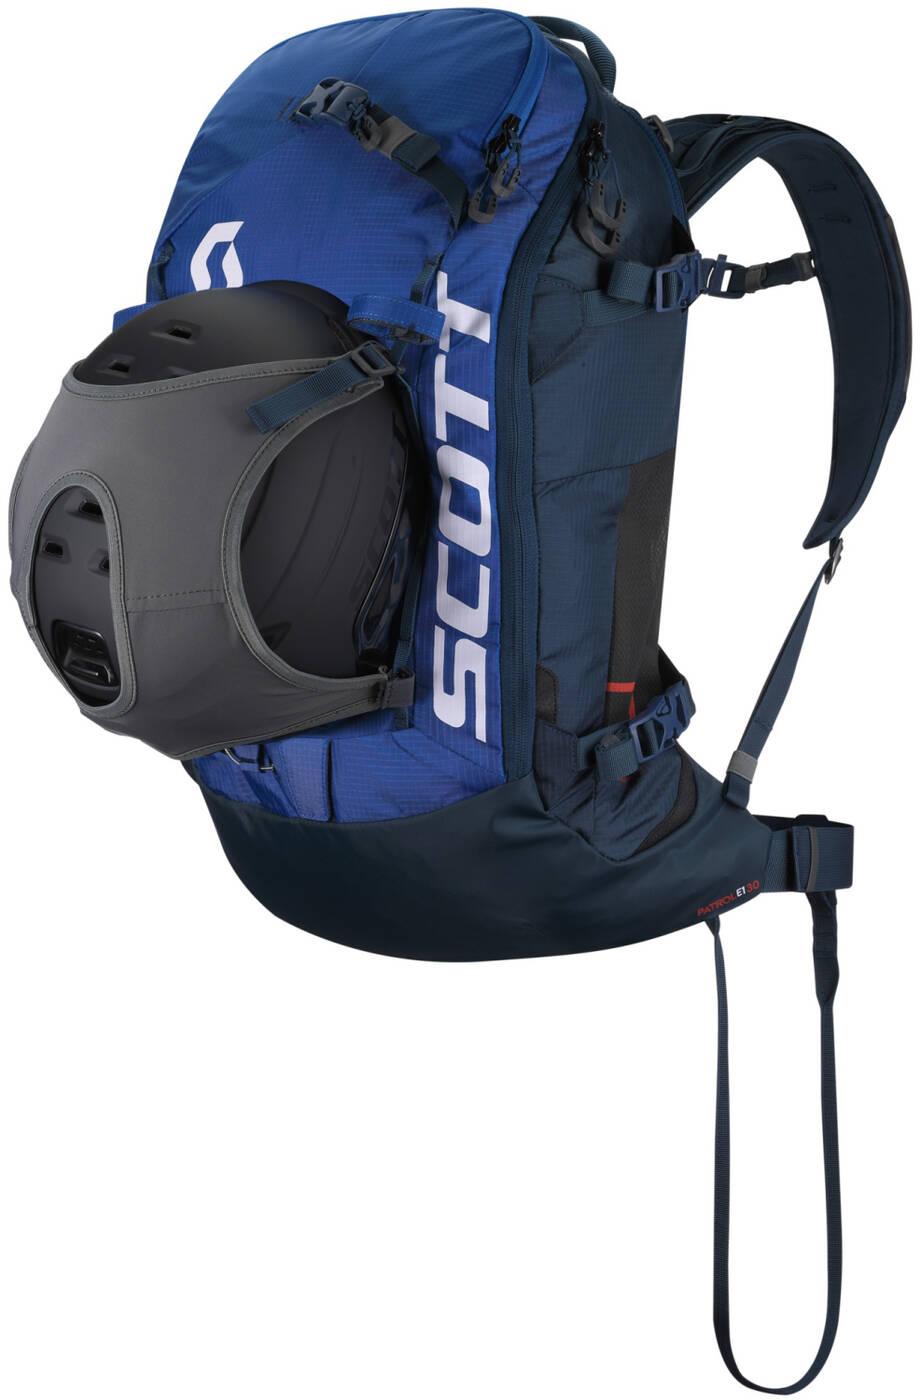 scott-patrol-alpride-e1-30l-avalanche-kit-backpack_ s helmou.jpg